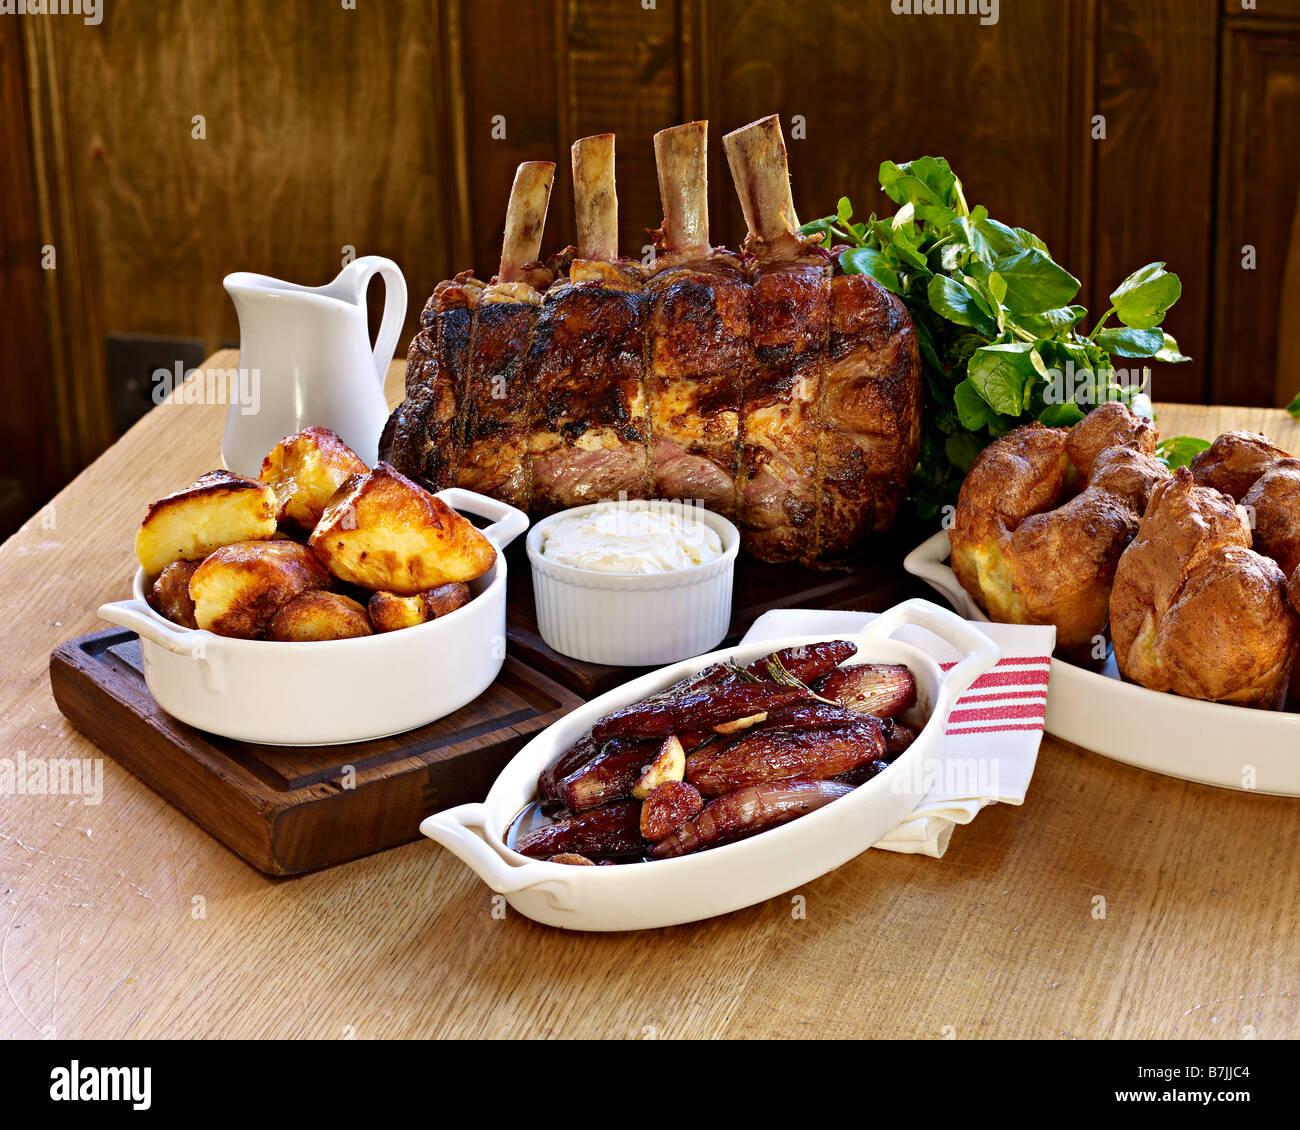 roast rib of beef sunday lunch - Stock Image